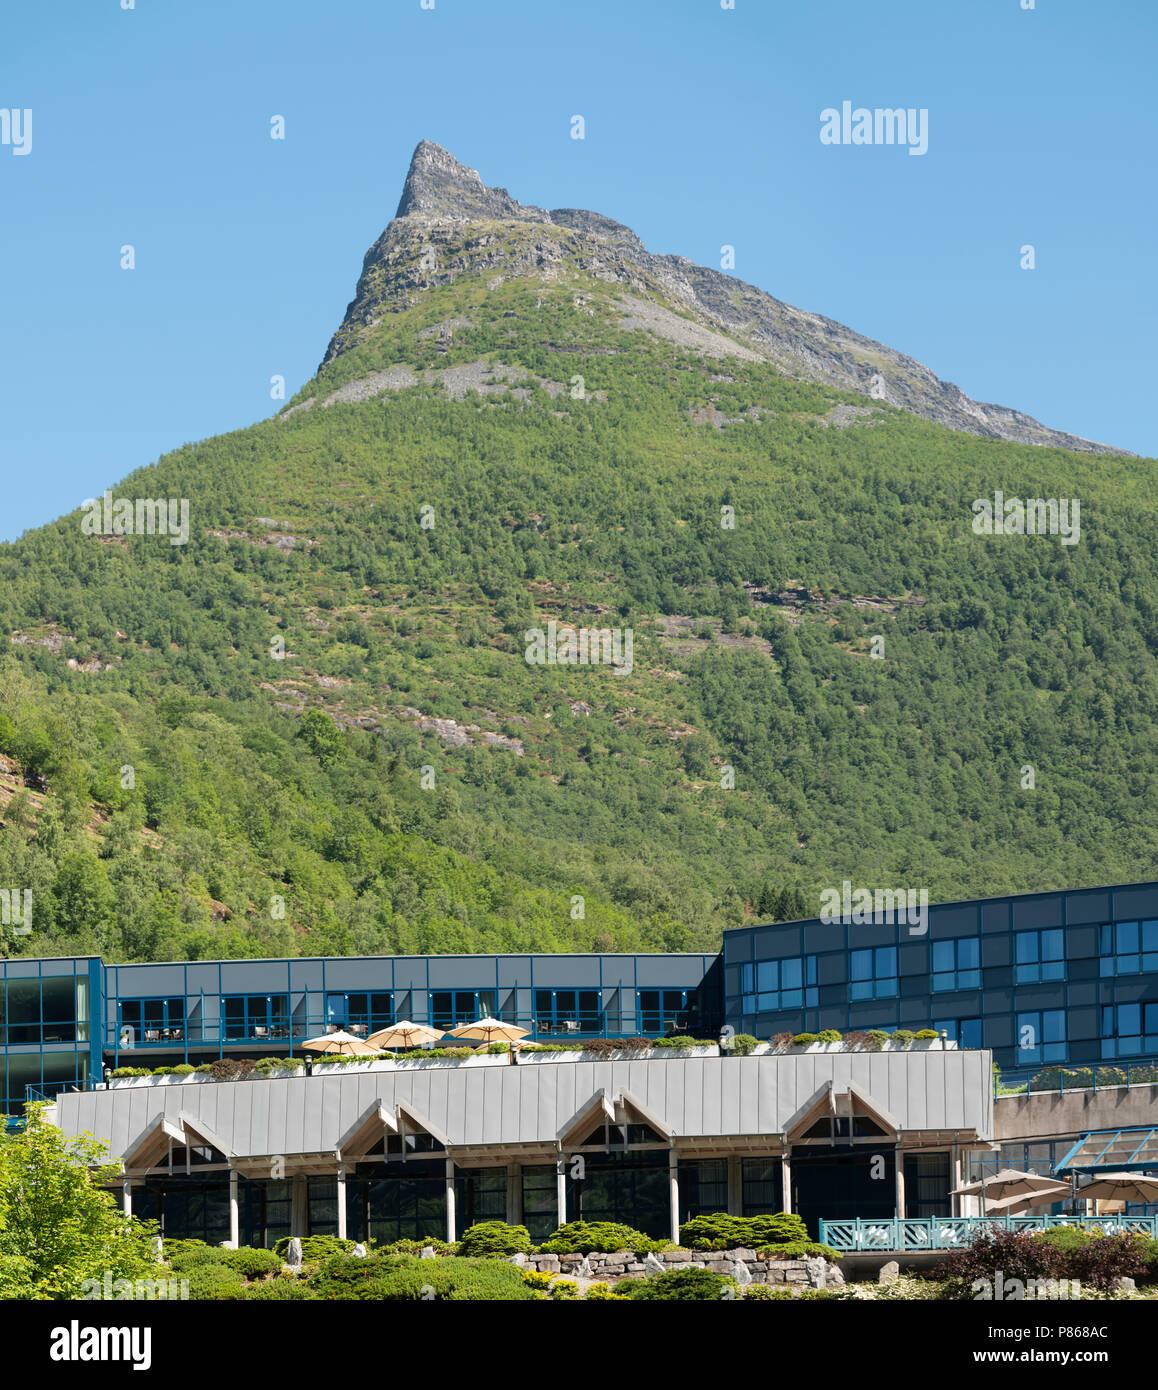 Hotel Union Geirangerfjord Norway Stock Photo 211579940